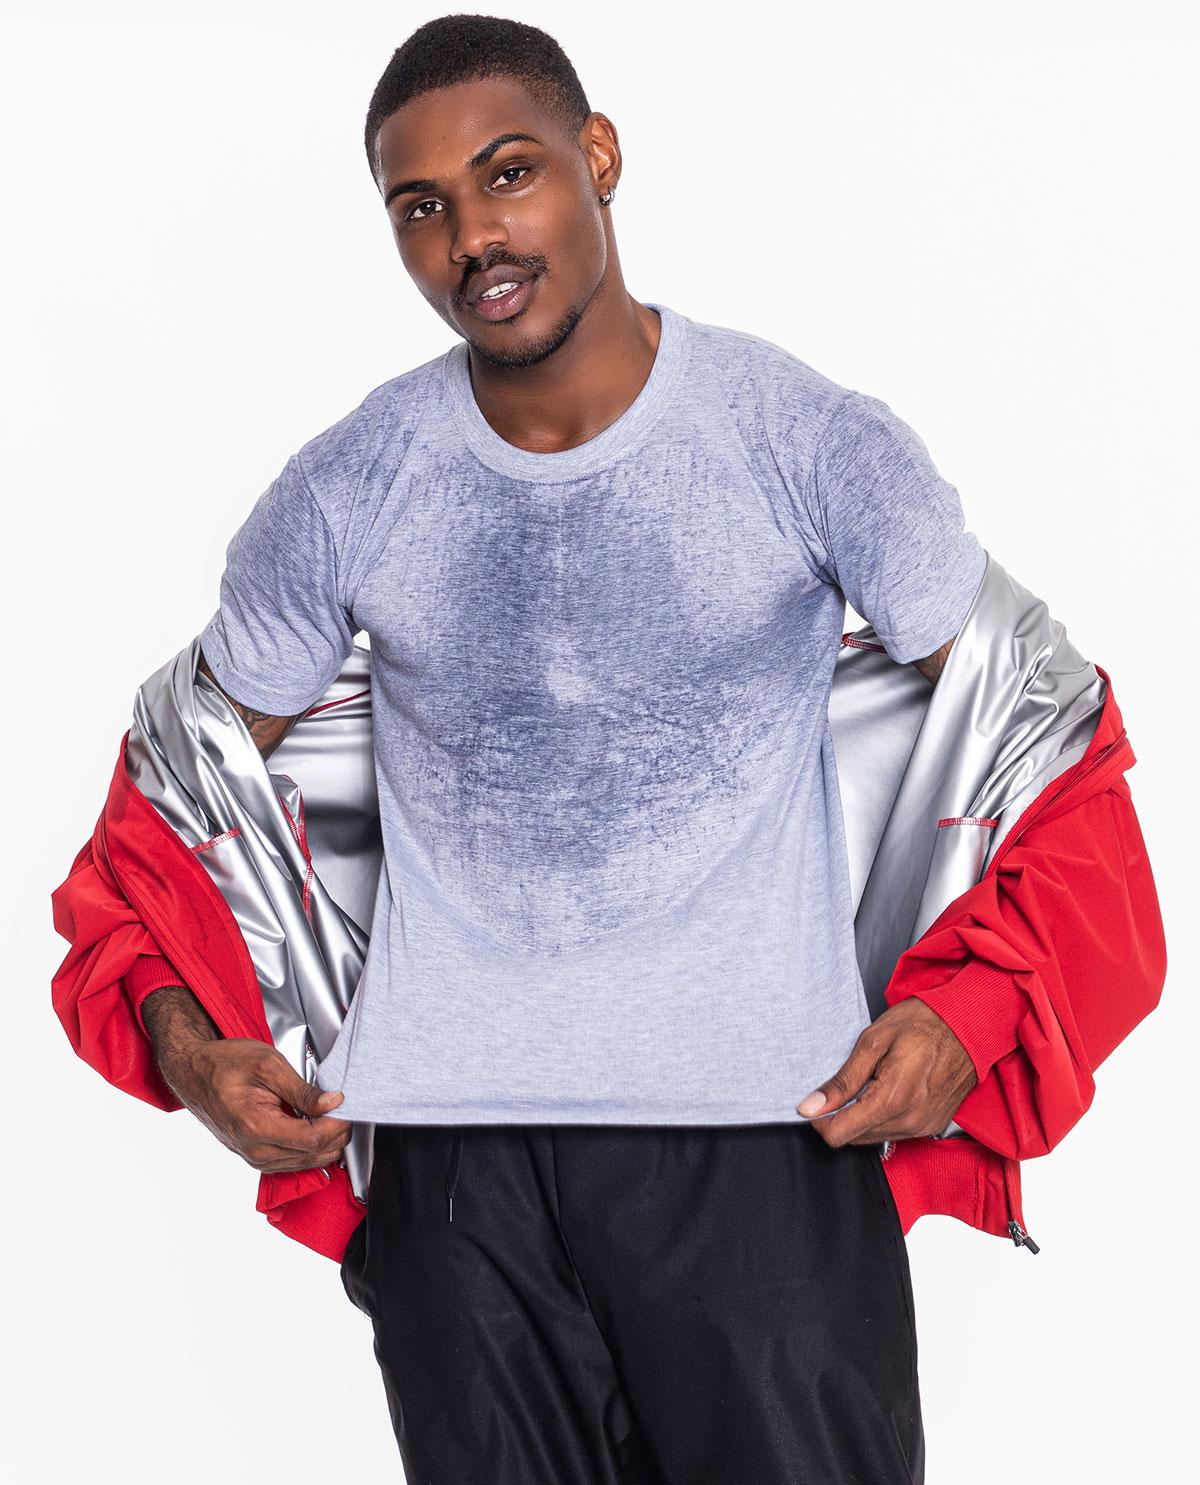 HIGH BREATHABILITY 투습률이 적용되어 피부가 호흡할 수 있게 도와주어 땀 배출이 시작될 때 답답함을 줄여줌 [기능성 핫슈트 착용의 체중감량과 에너지 소모량및 운동 효율성에 미치는 영향] 논문 발표와 함께 한국 스포츠 학회지에 체지방, 체중감소량, 칼로리 소비 증가 입증